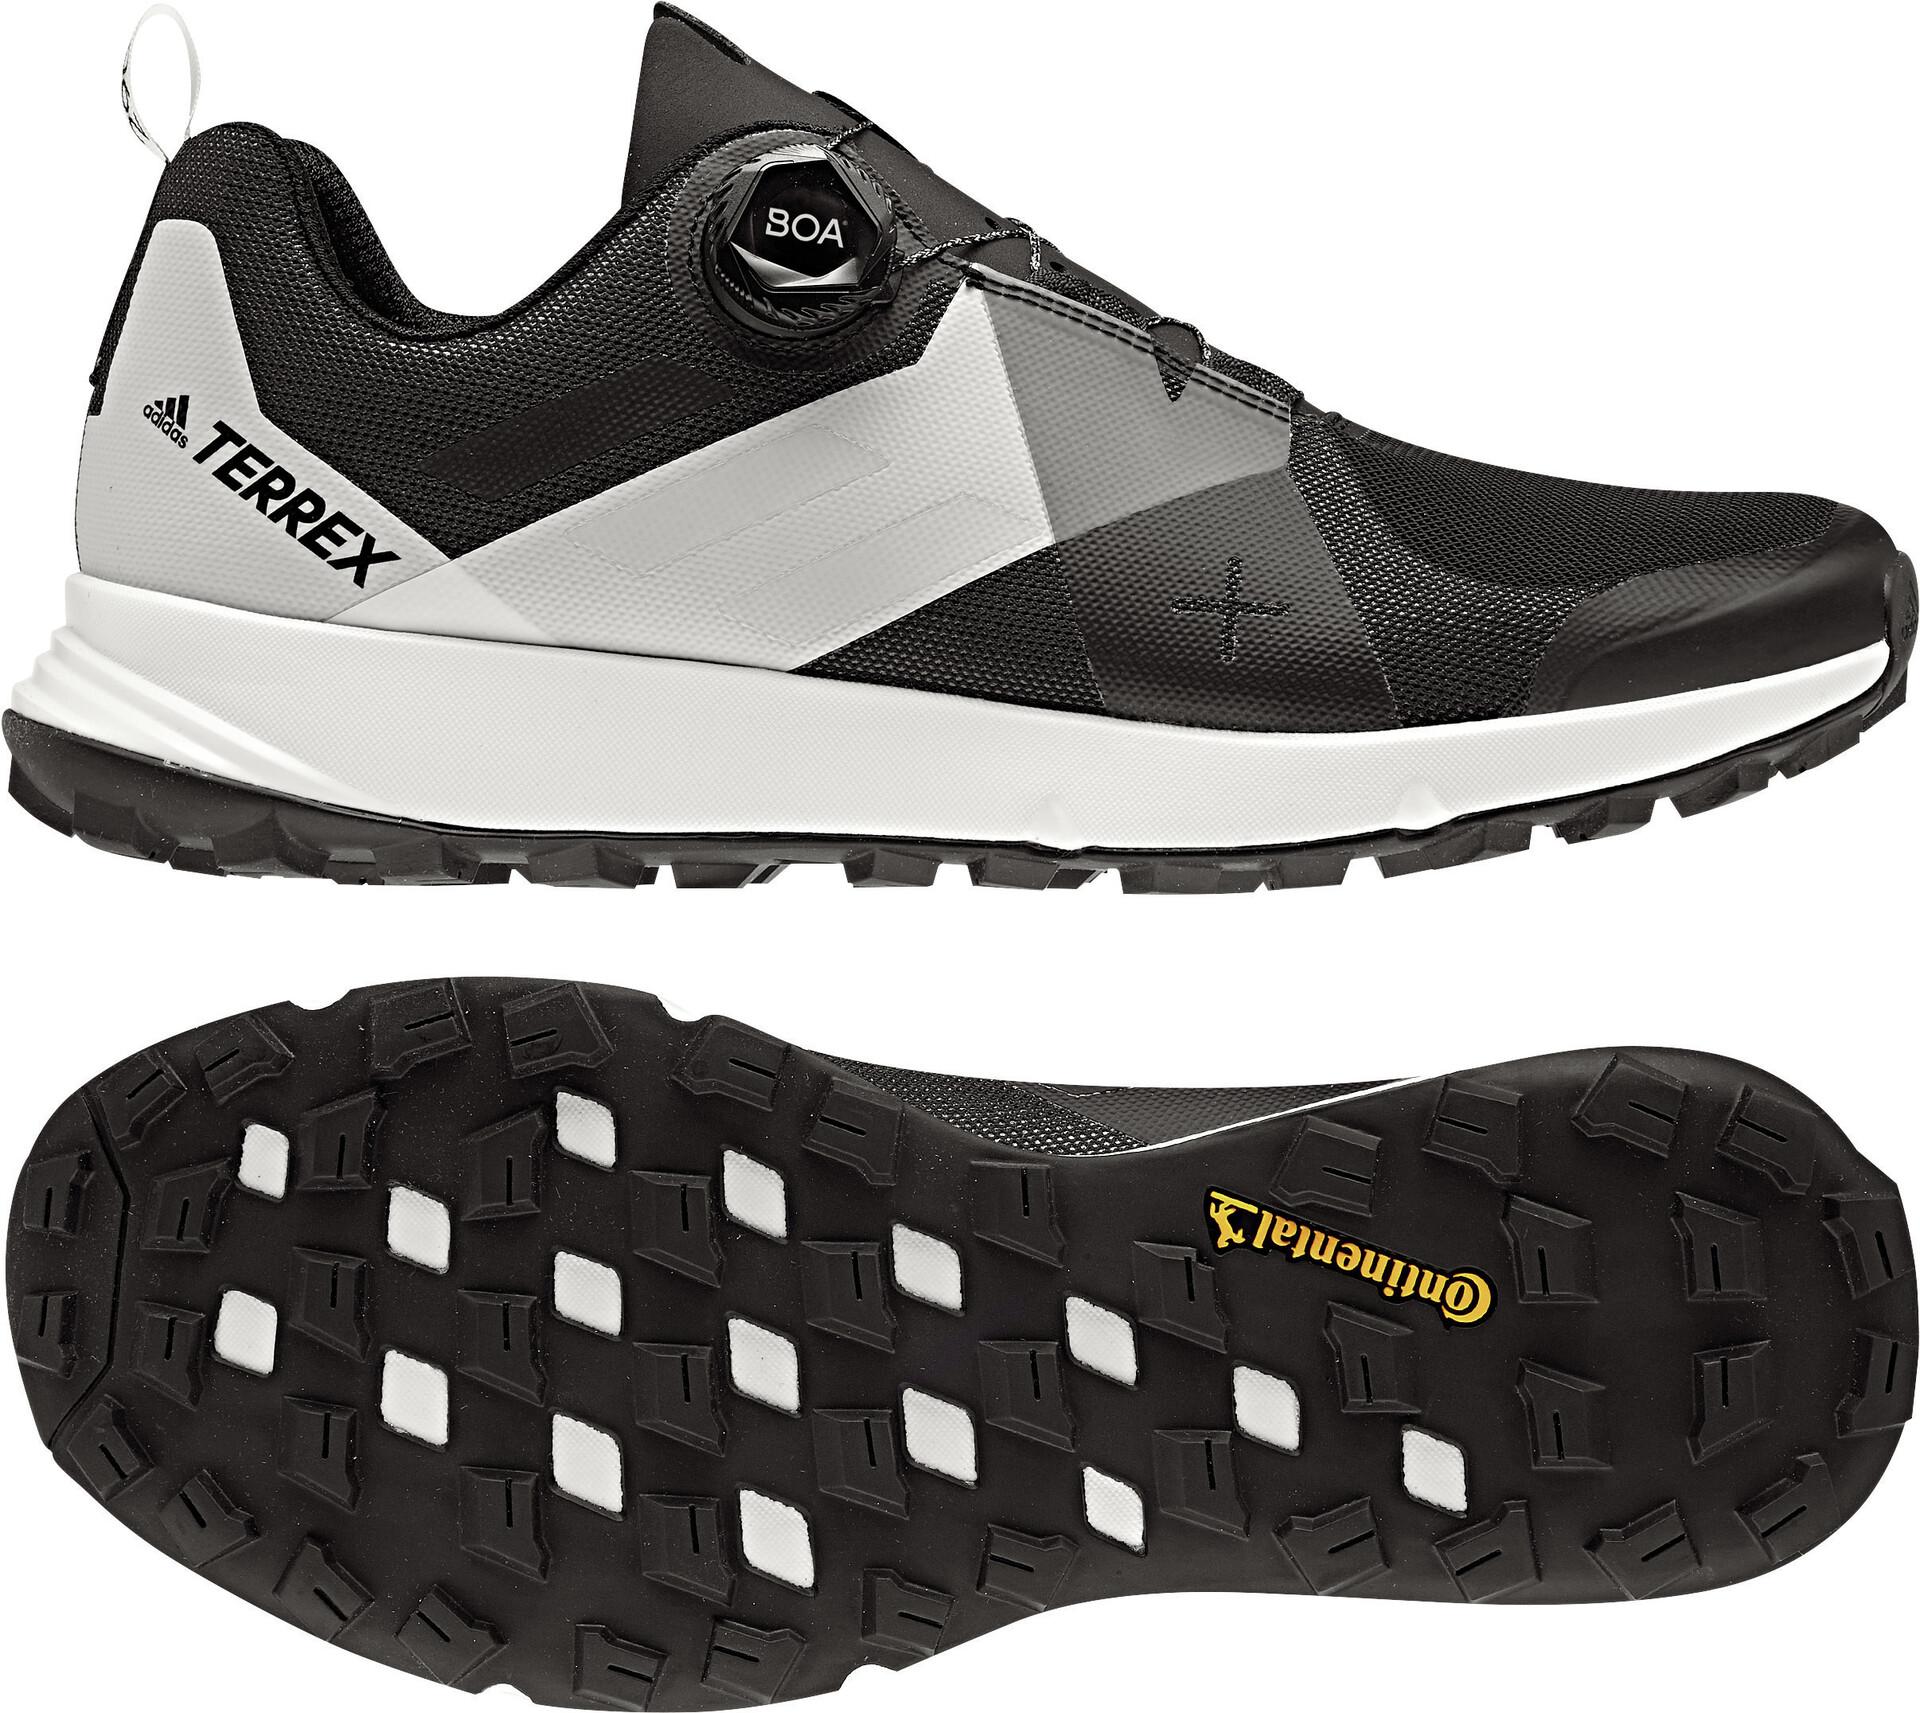 adidas TERREX Two Boa Løbesko Herrer, core blackgrey fourftwr white